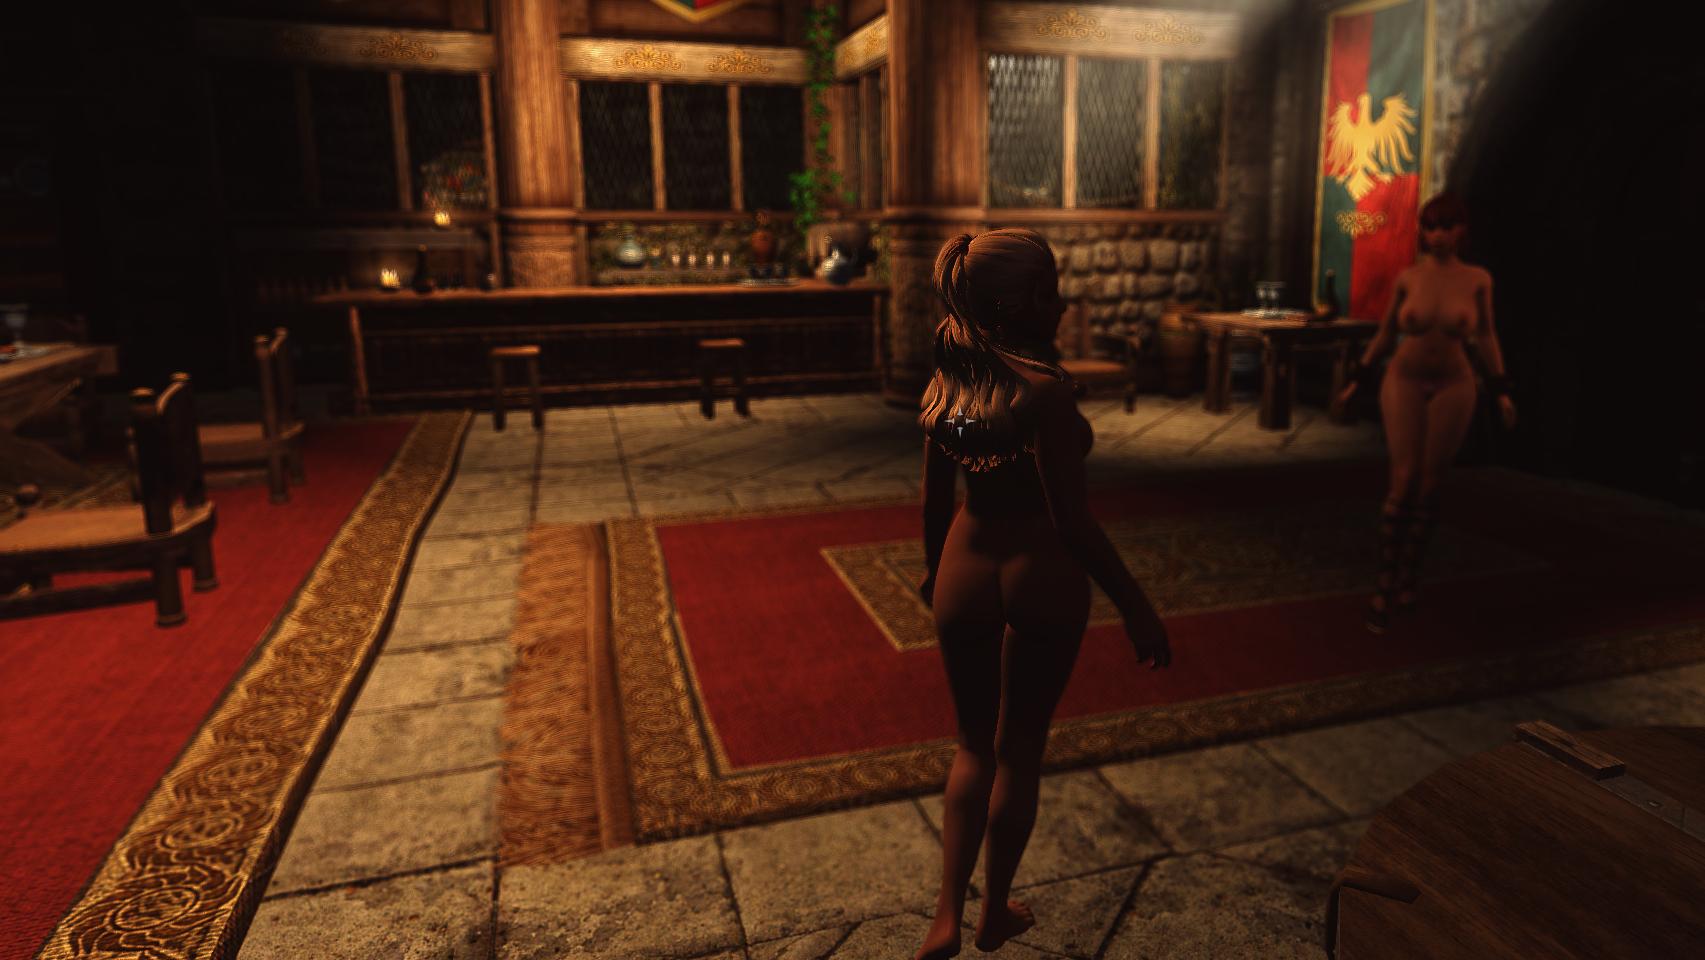 Tes V - Skyrim Screenshot 2018.09.13 - 05.40.44.45 (2).png - Elder Scrolls 5: Skyrim, the